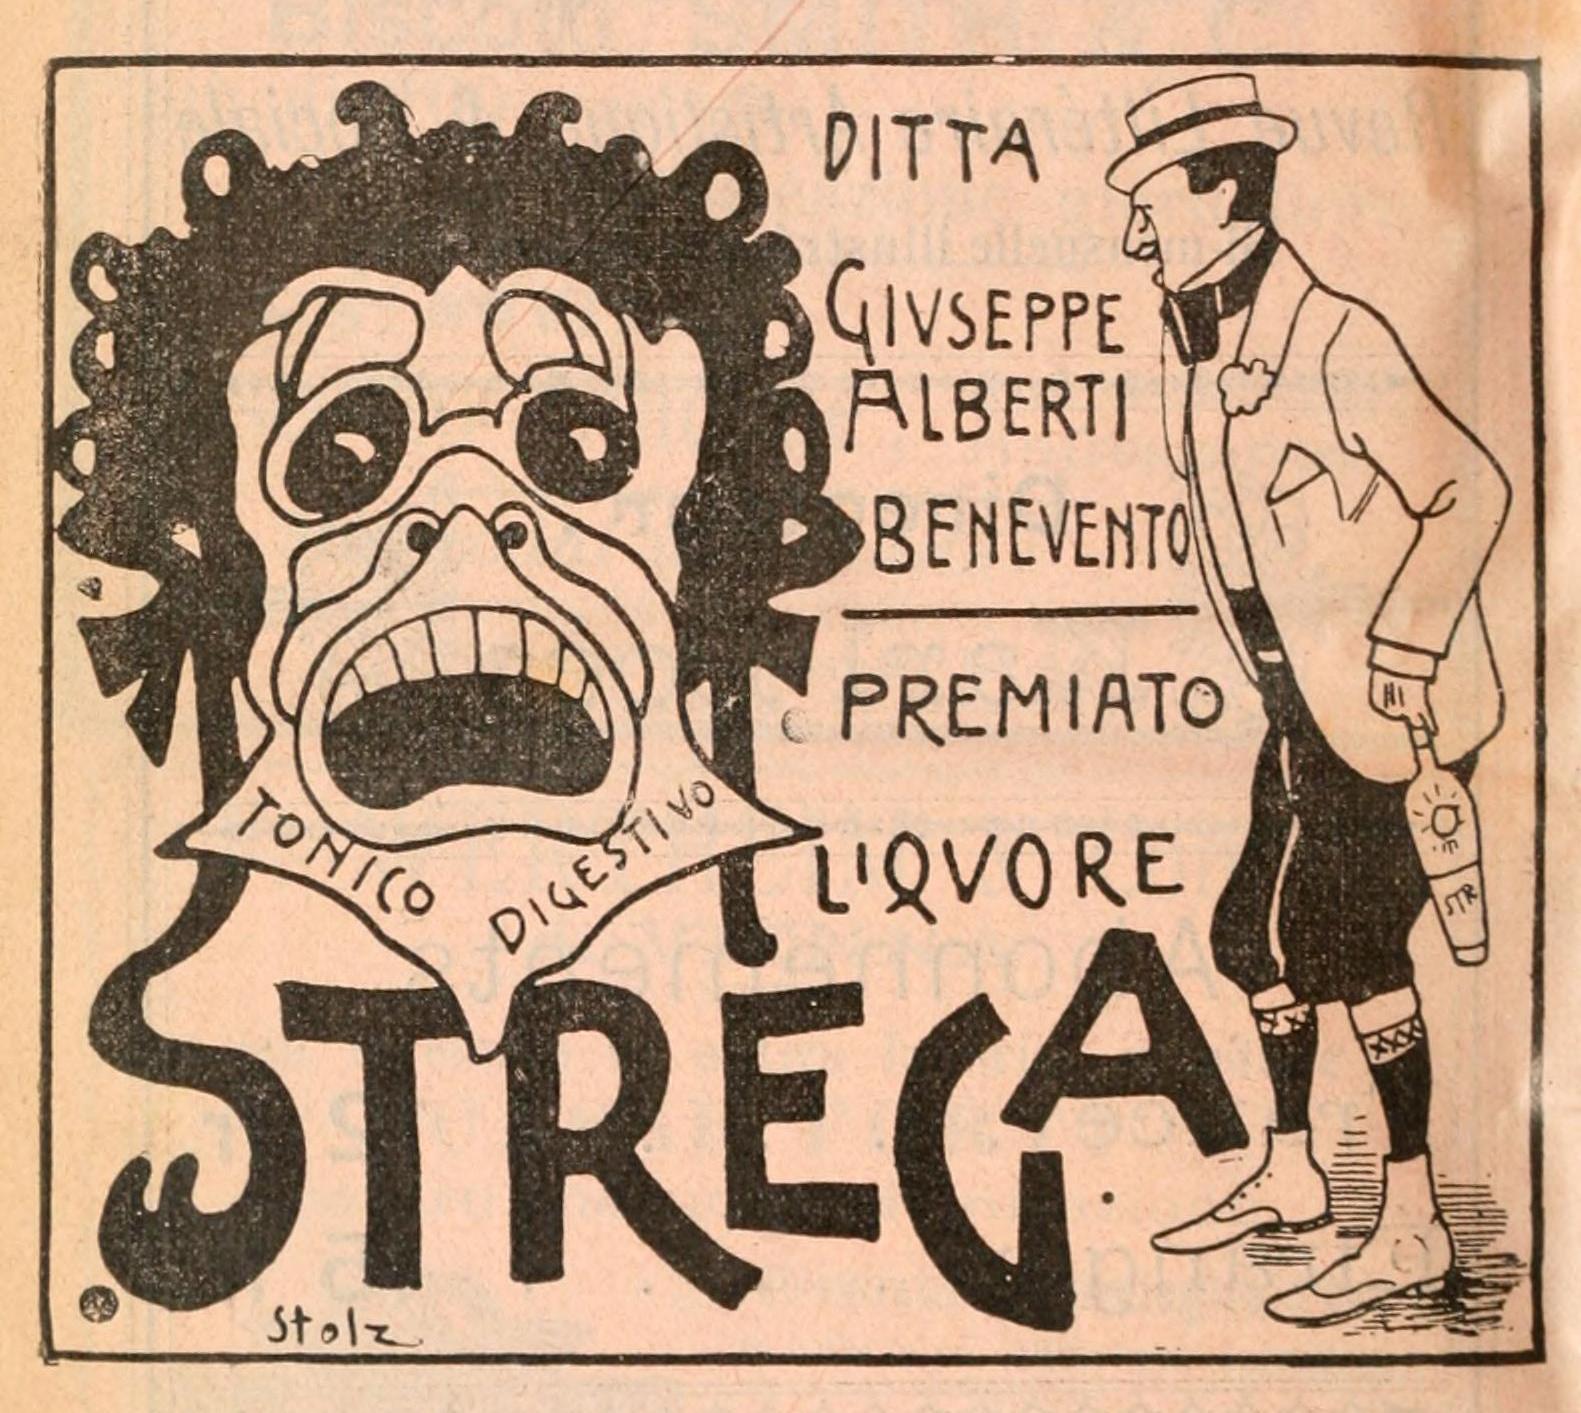 Advert for Strega liqueur printed in Matilde Serao